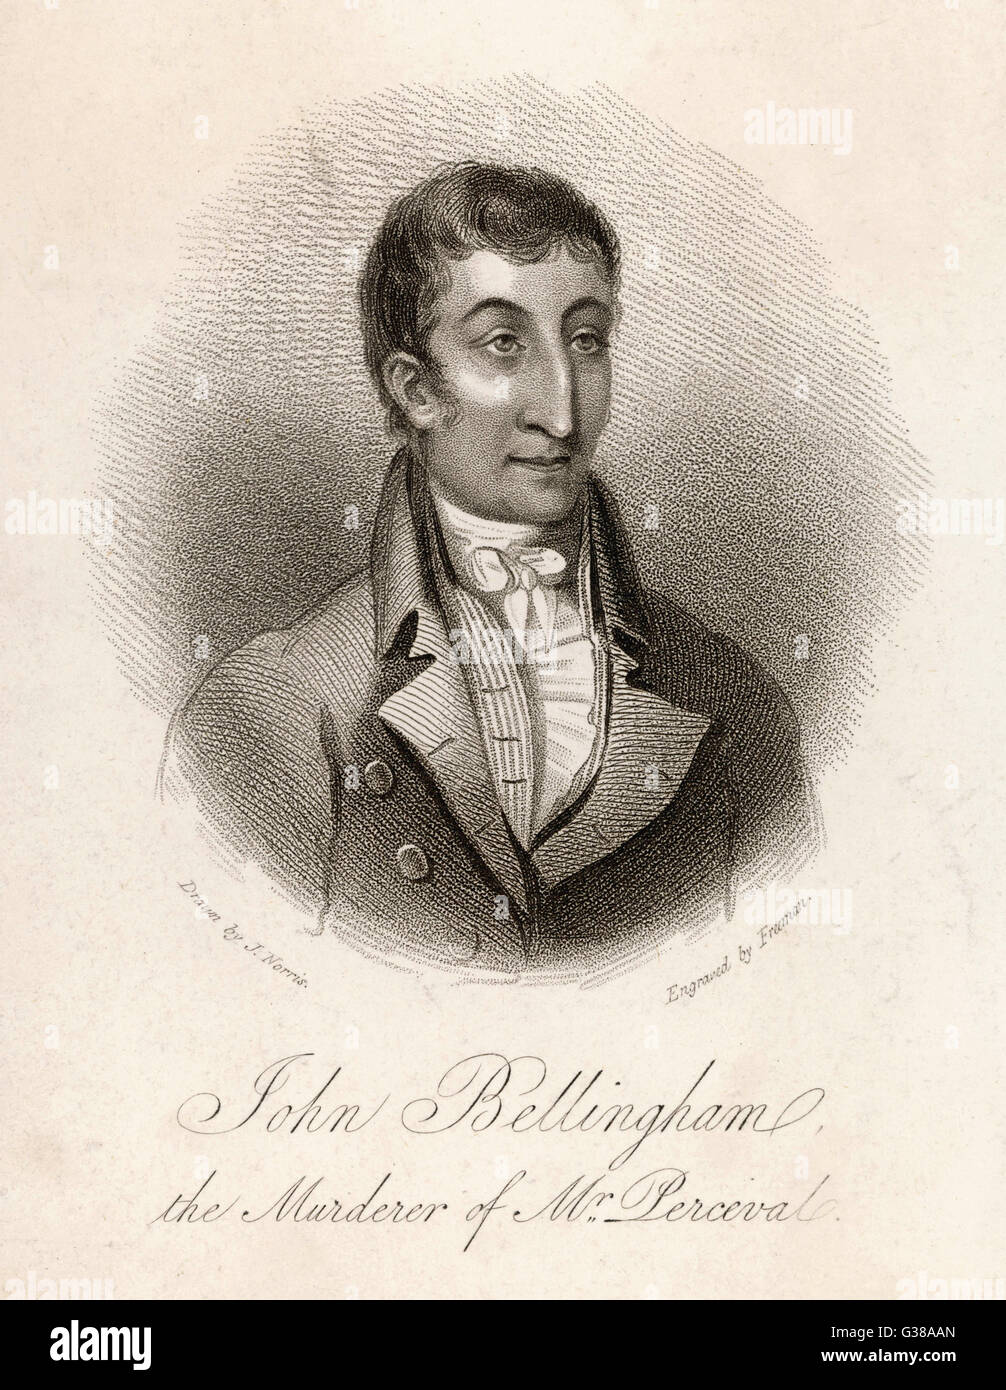 John Bellingham - Spencer Perceval della killer data: 1812 Immagini Stock